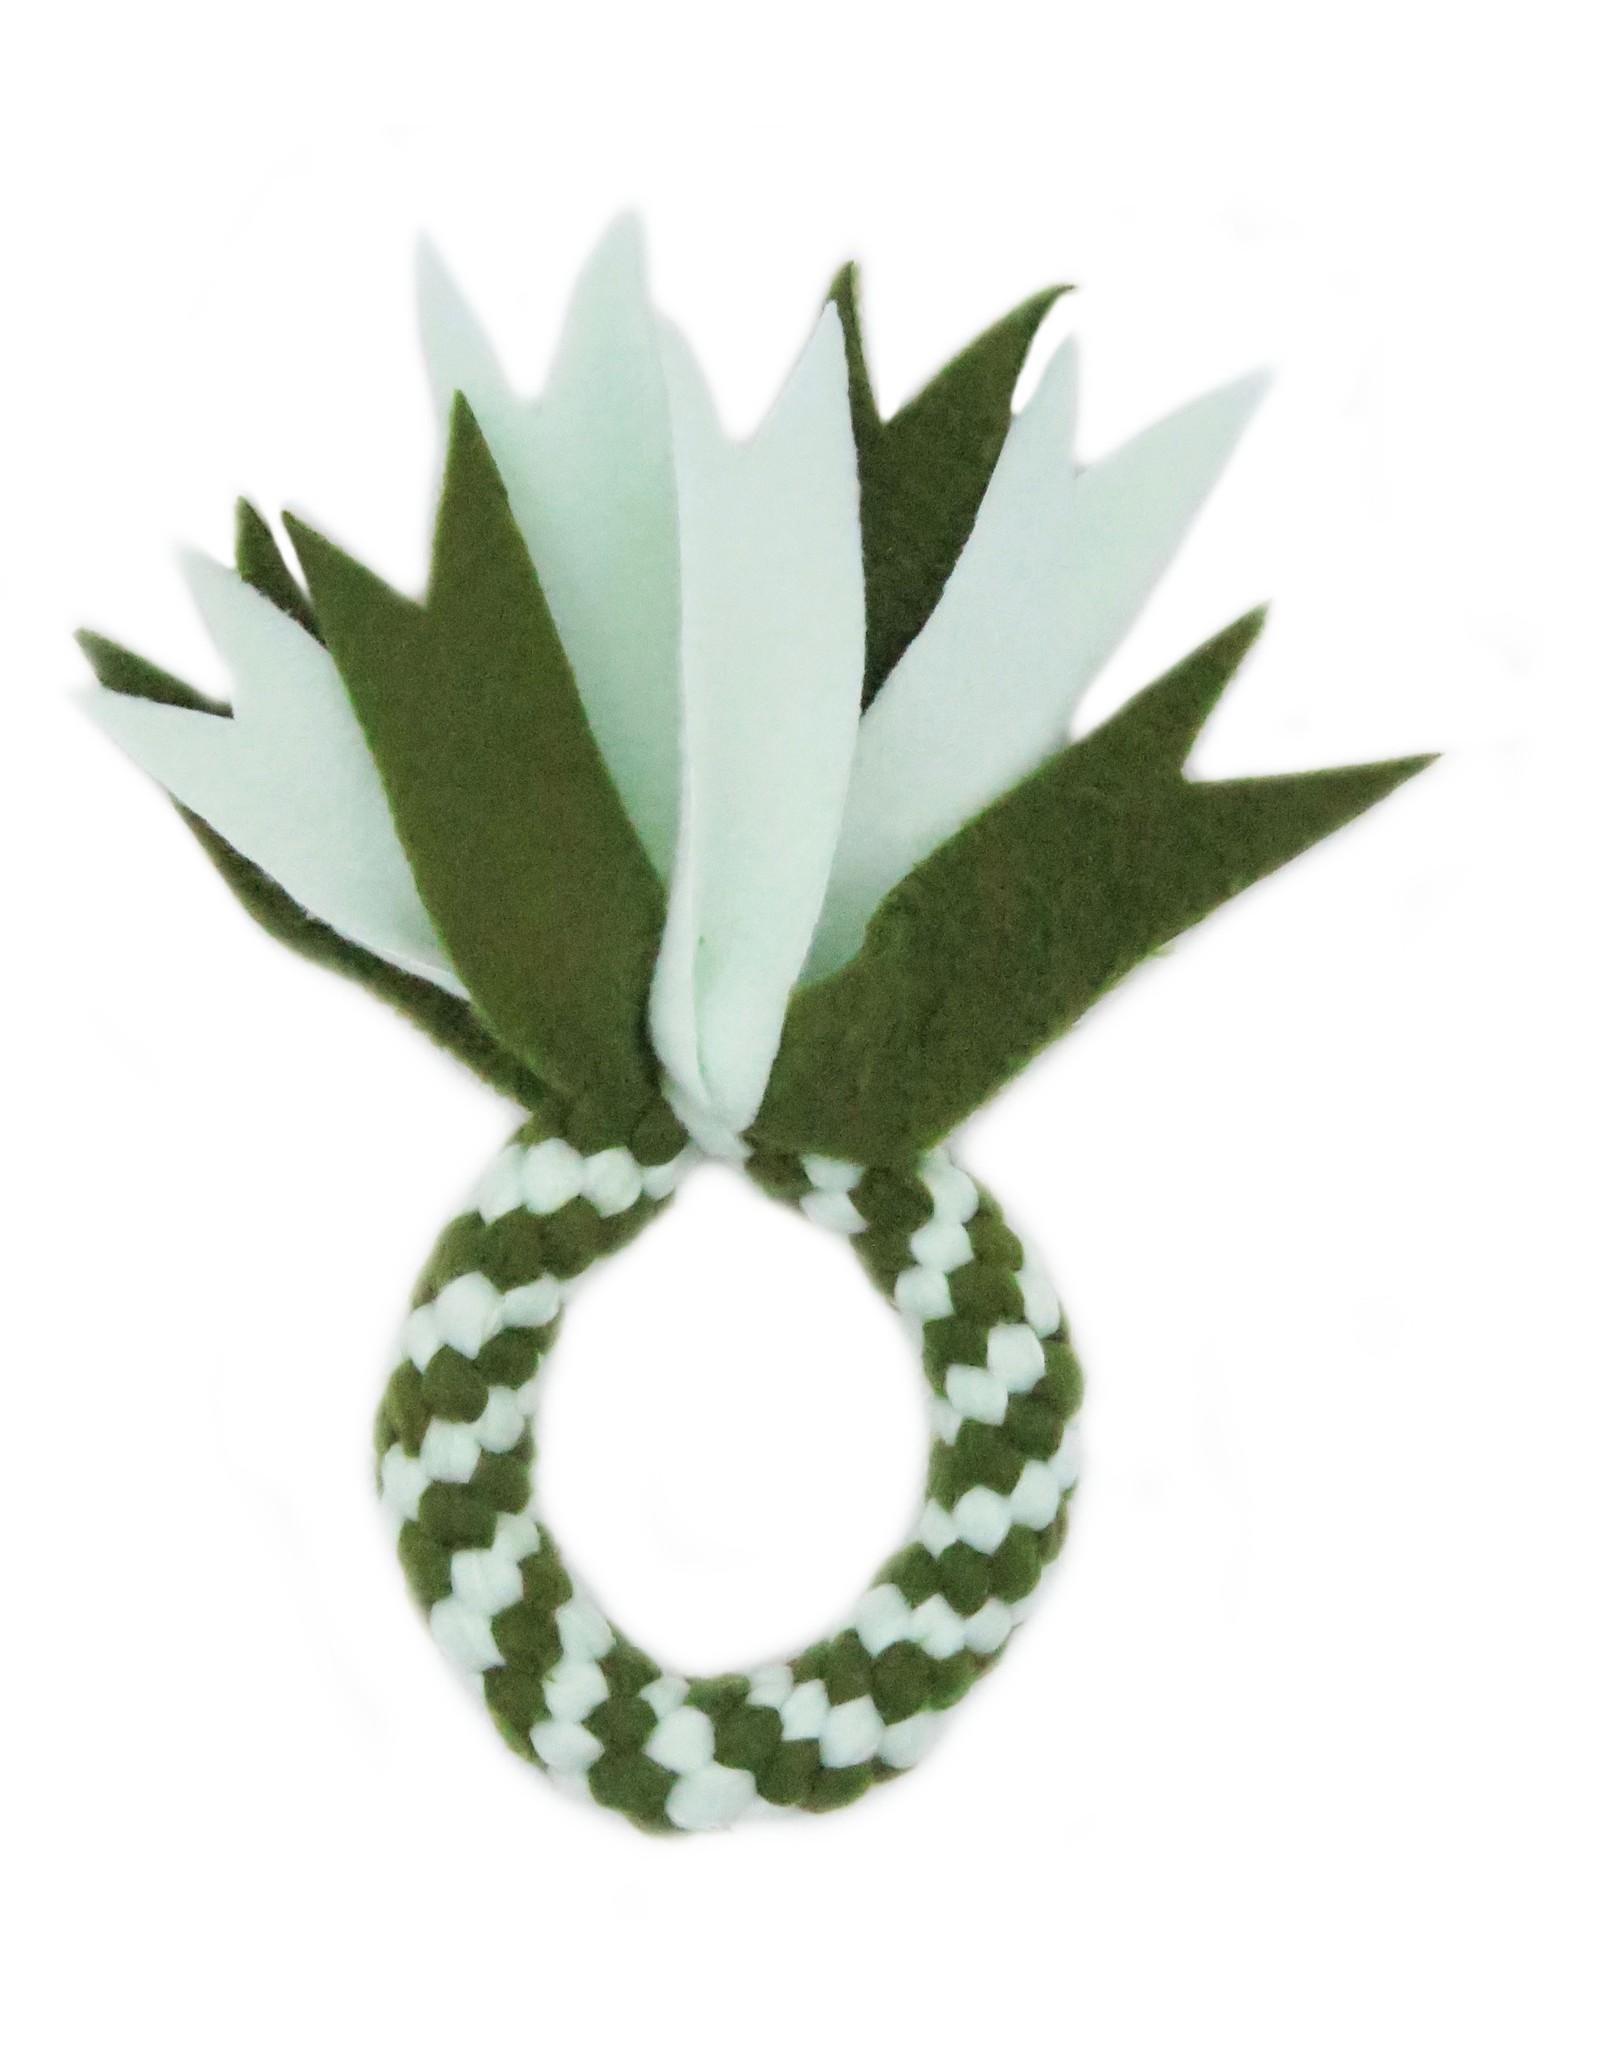 Minty green round fleece toy